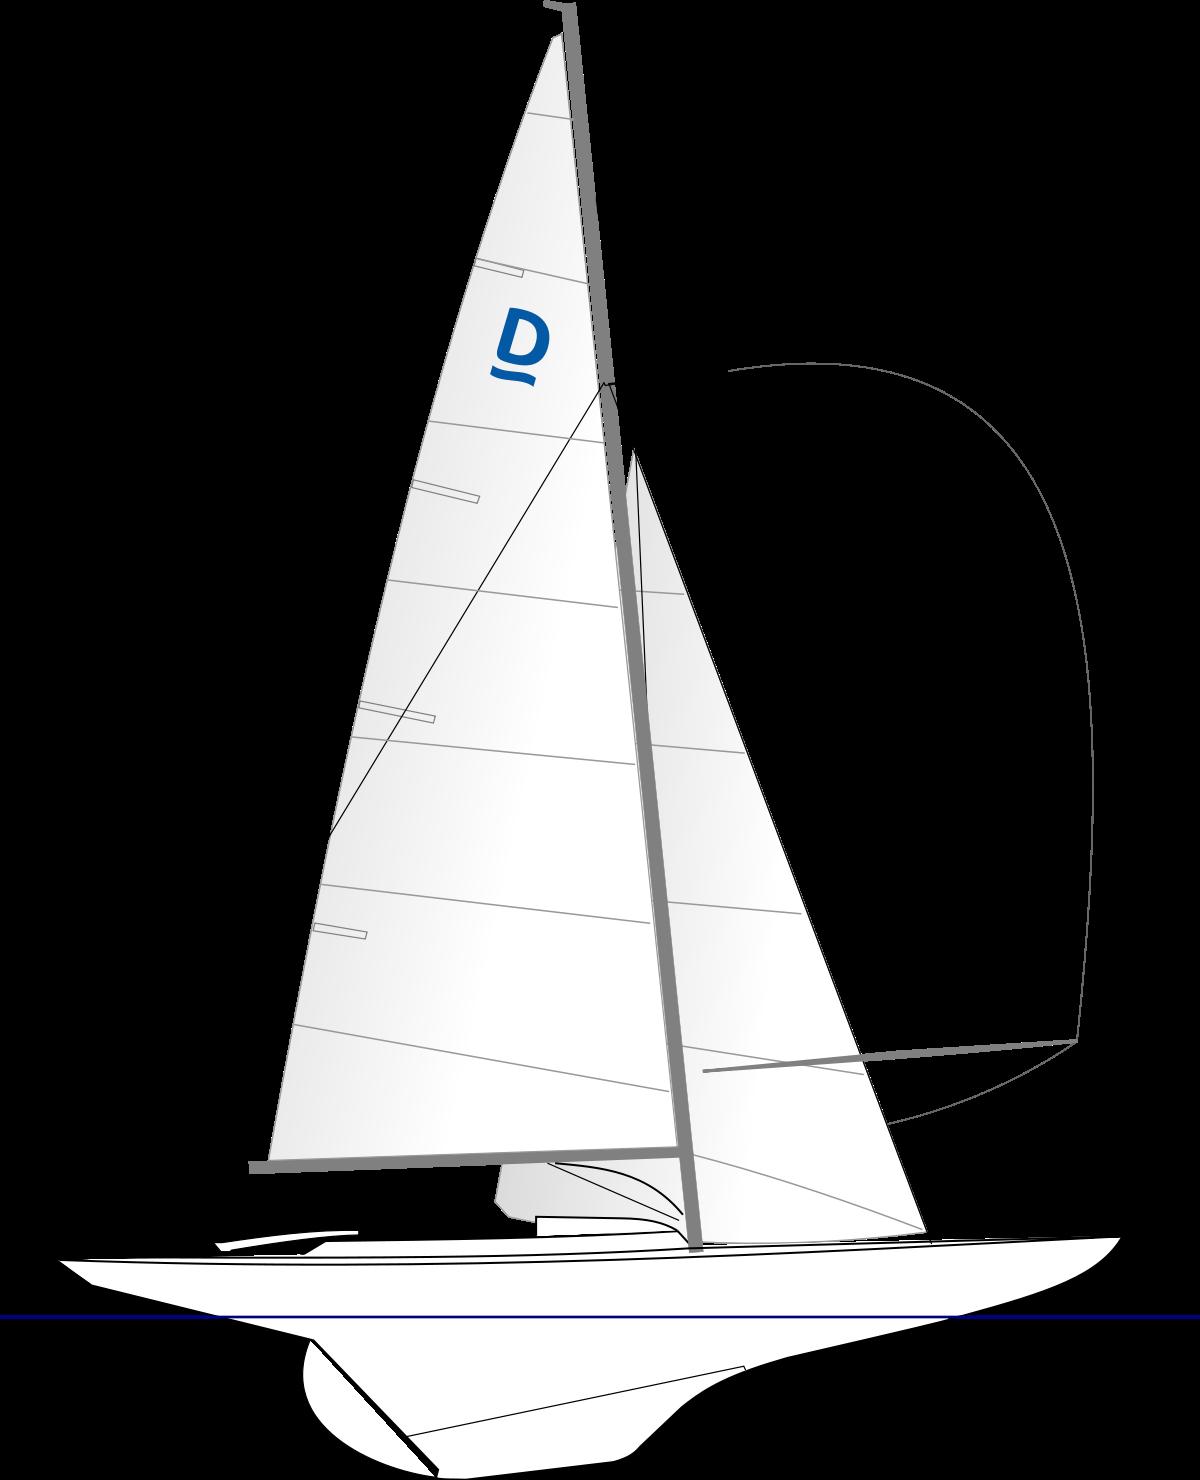 Riss Drachen mit Klassensymbol «D»